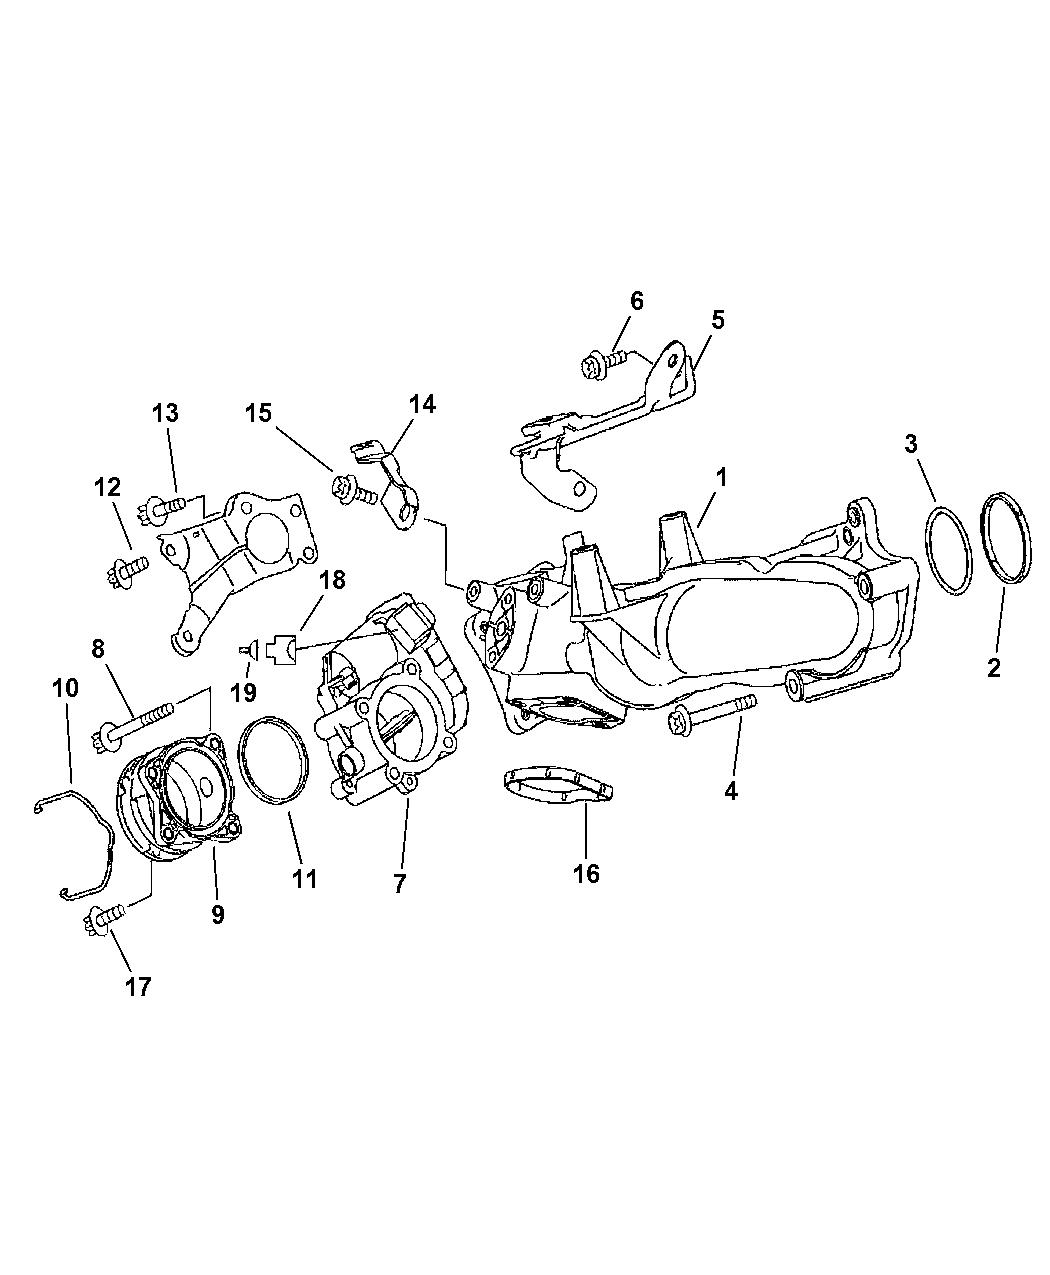 2007 Dodge Sprinter 2500 Intake Manifold Mopar Parts Giant Engine Diagram Manufold Thumbnail 2